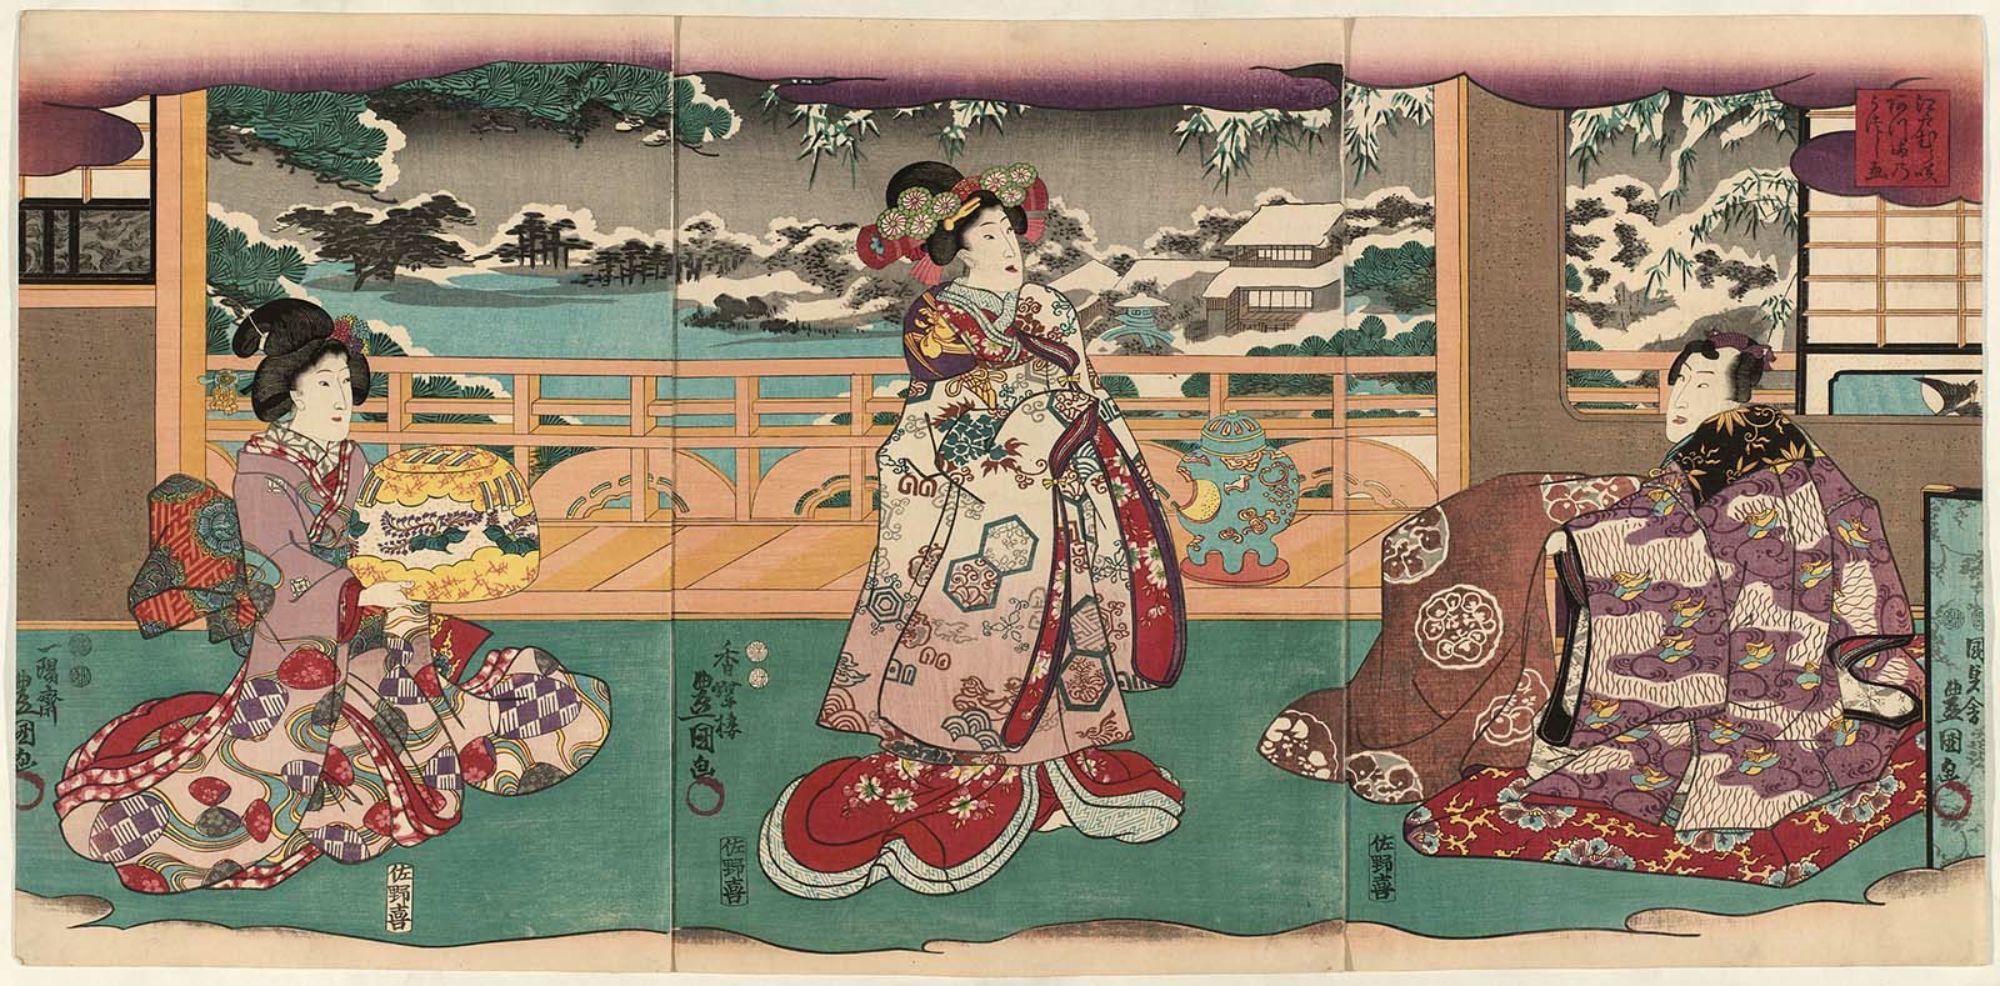 Murasaki - Murasaki